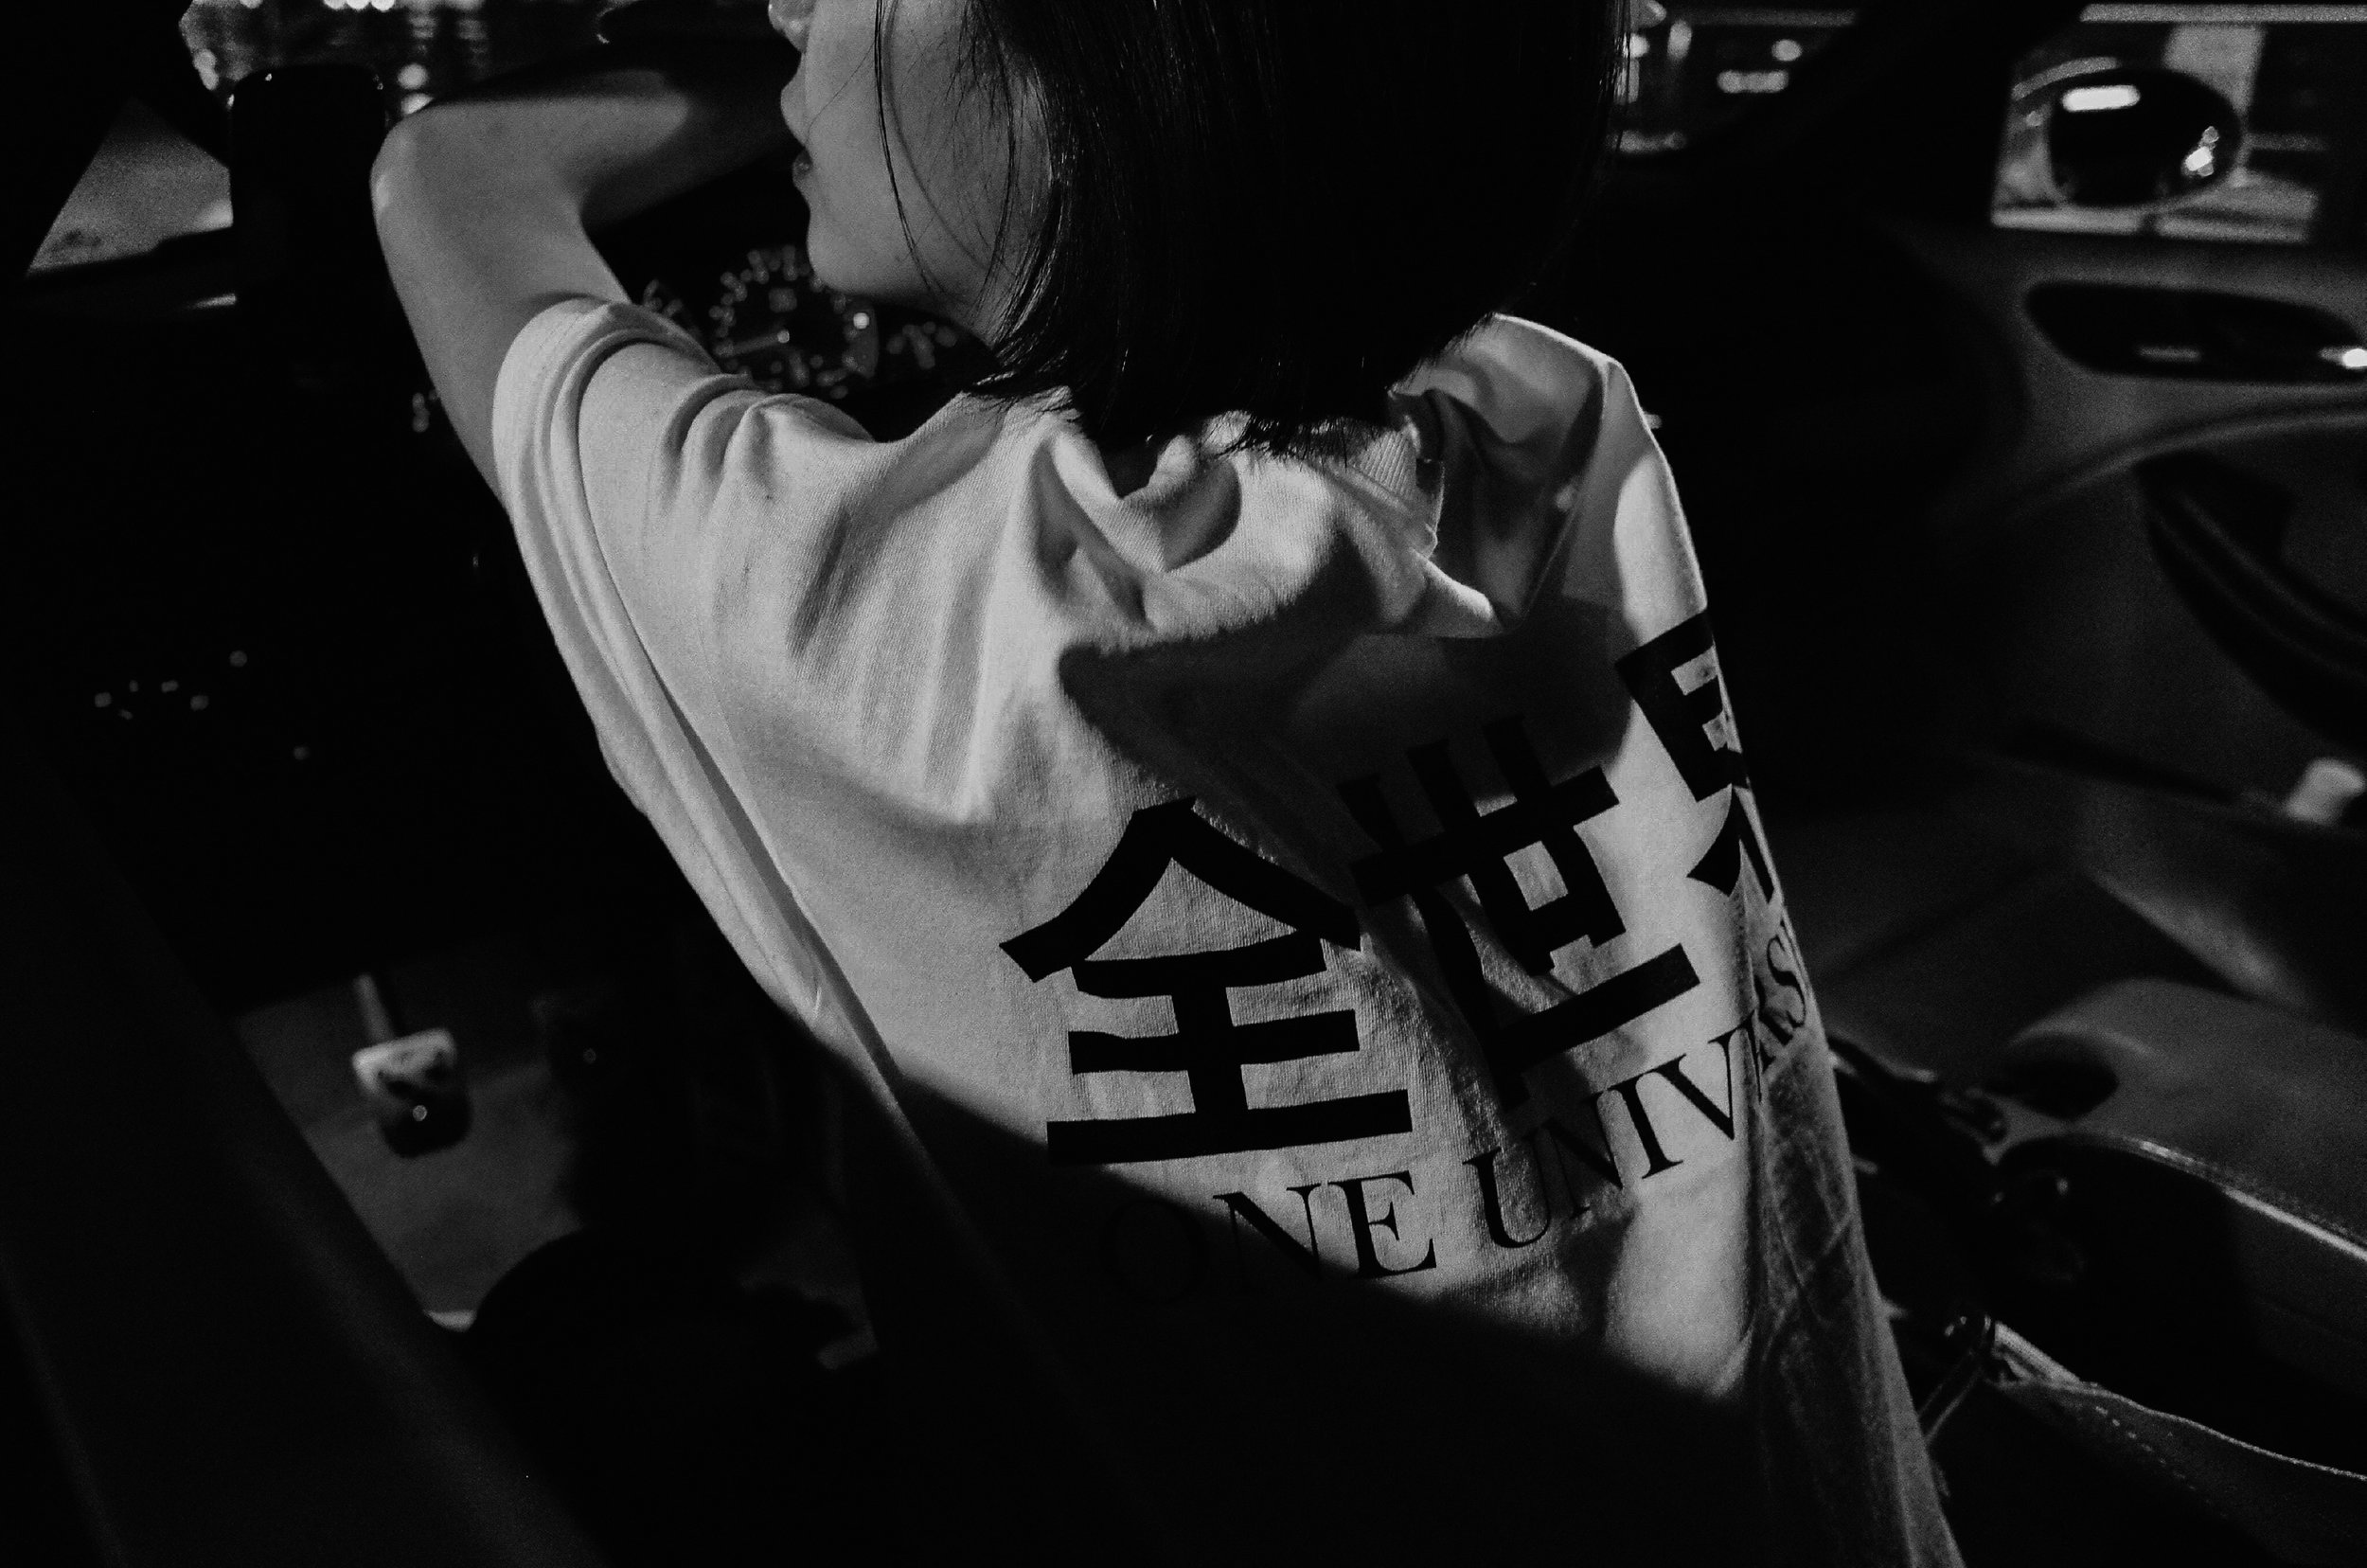 [Peaches] E46 Night-out - 全世界-3.jpg